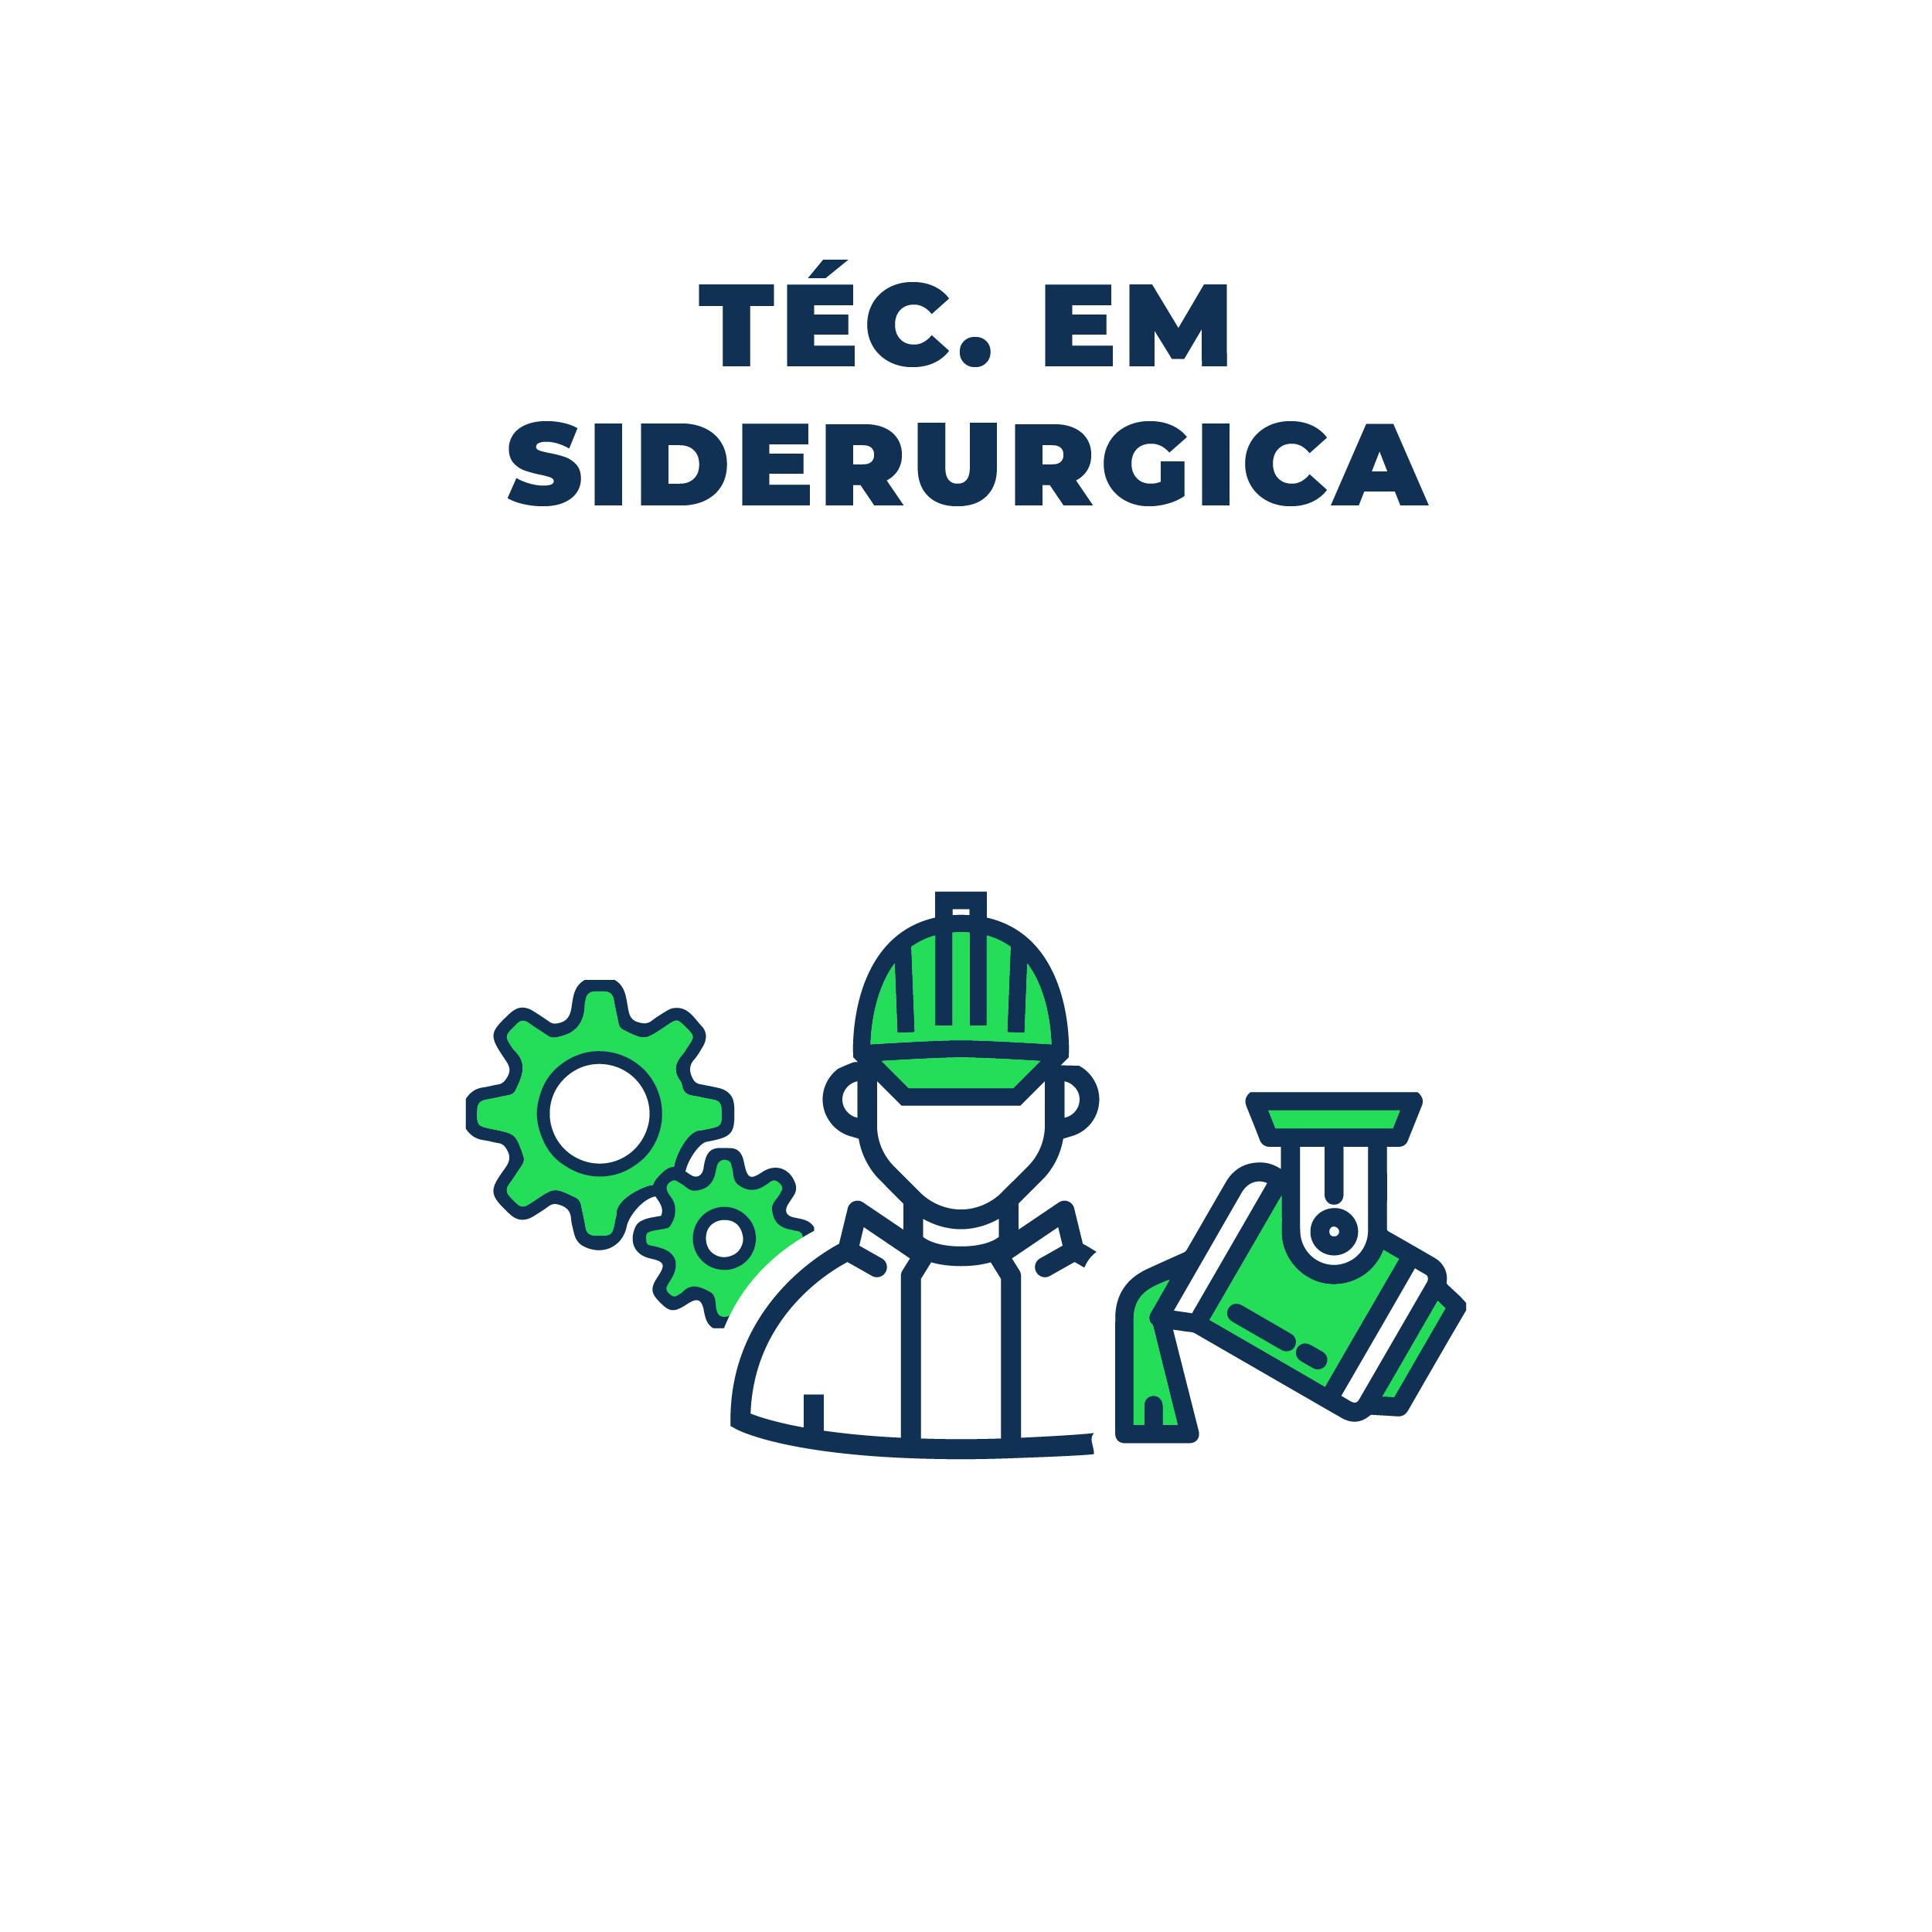 siderurgica